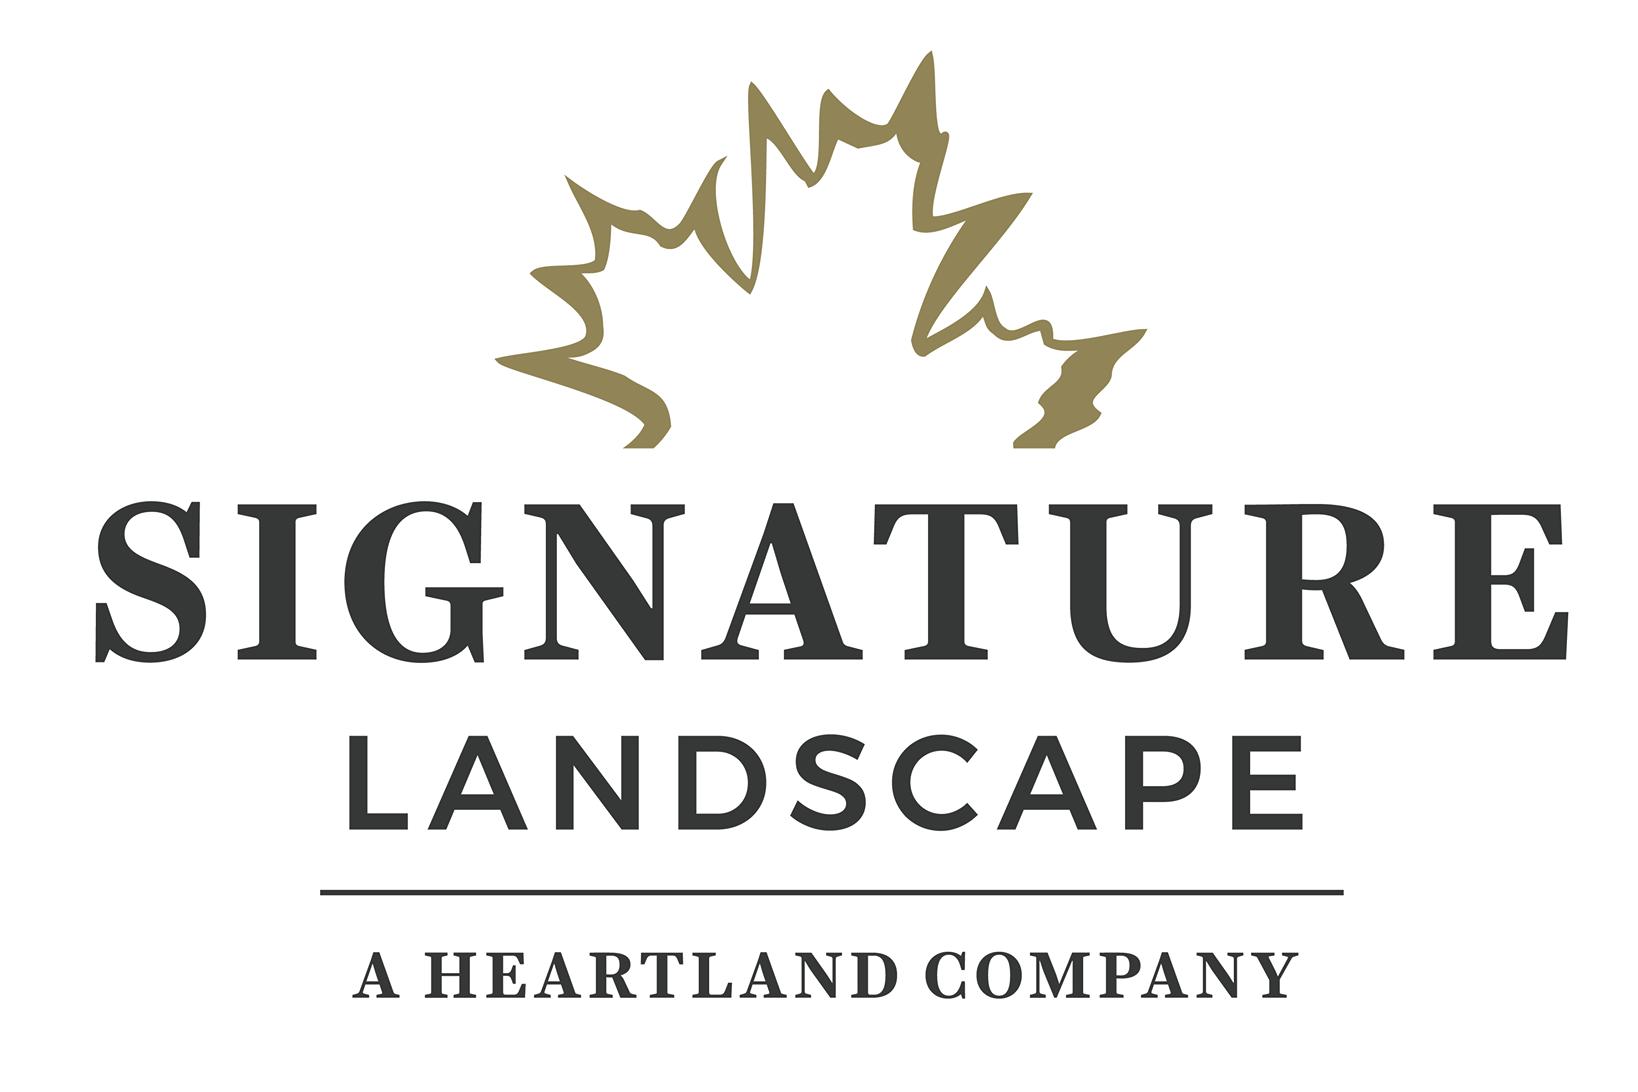 https://www.youraspire.com/hubfs/signature-landscape-kc-logo-1.png